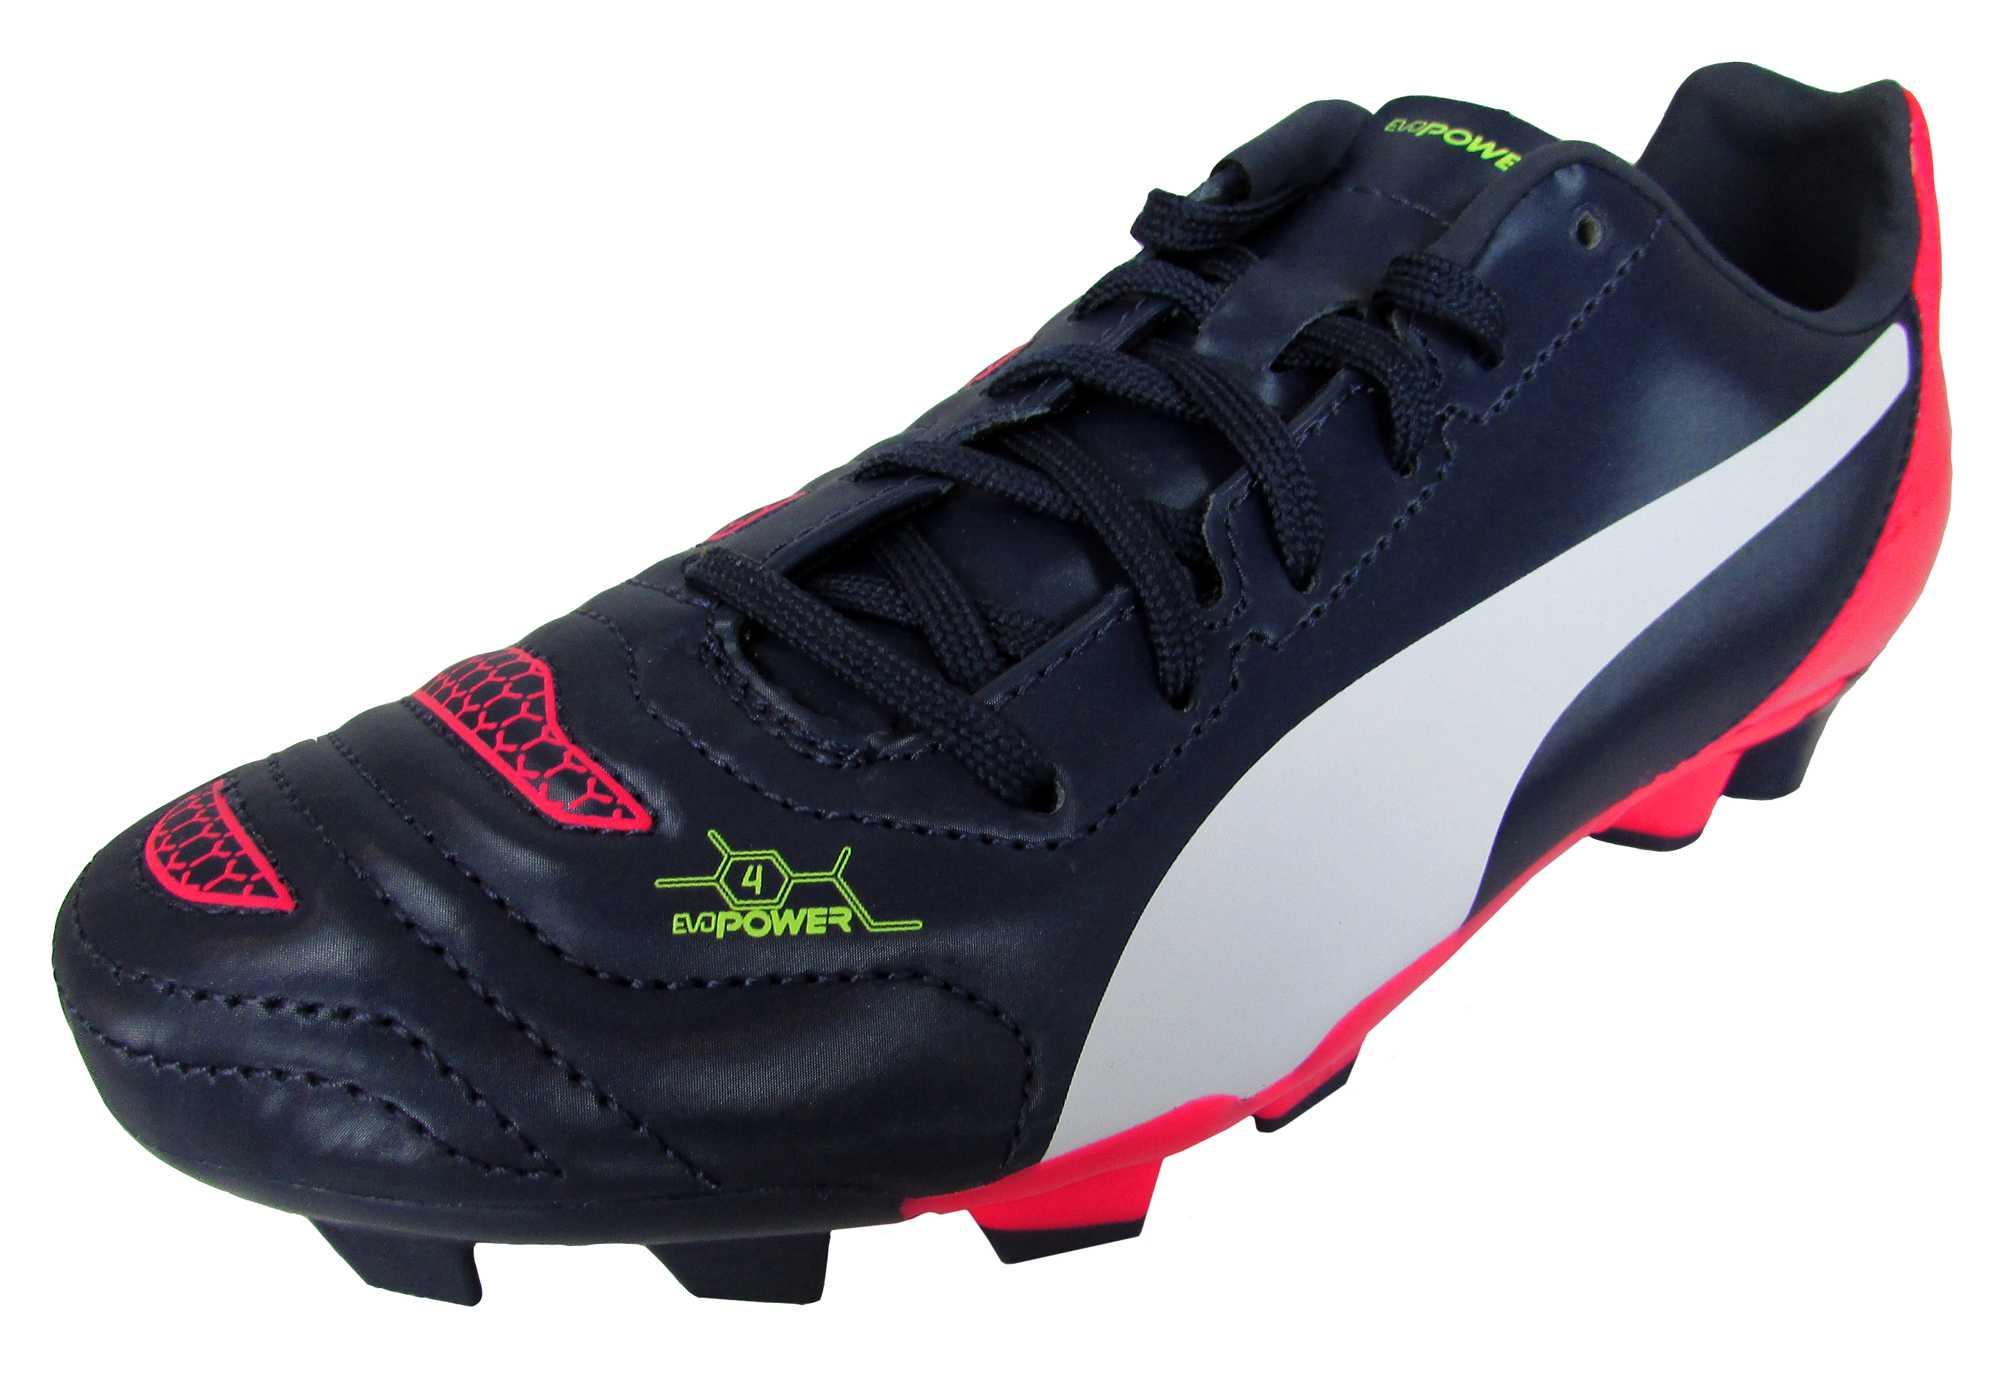 be62838d7 Boys Puma evoPOWER 4.2 FG Firm Ground Football Boots Junior Sizes Soccer  Boot